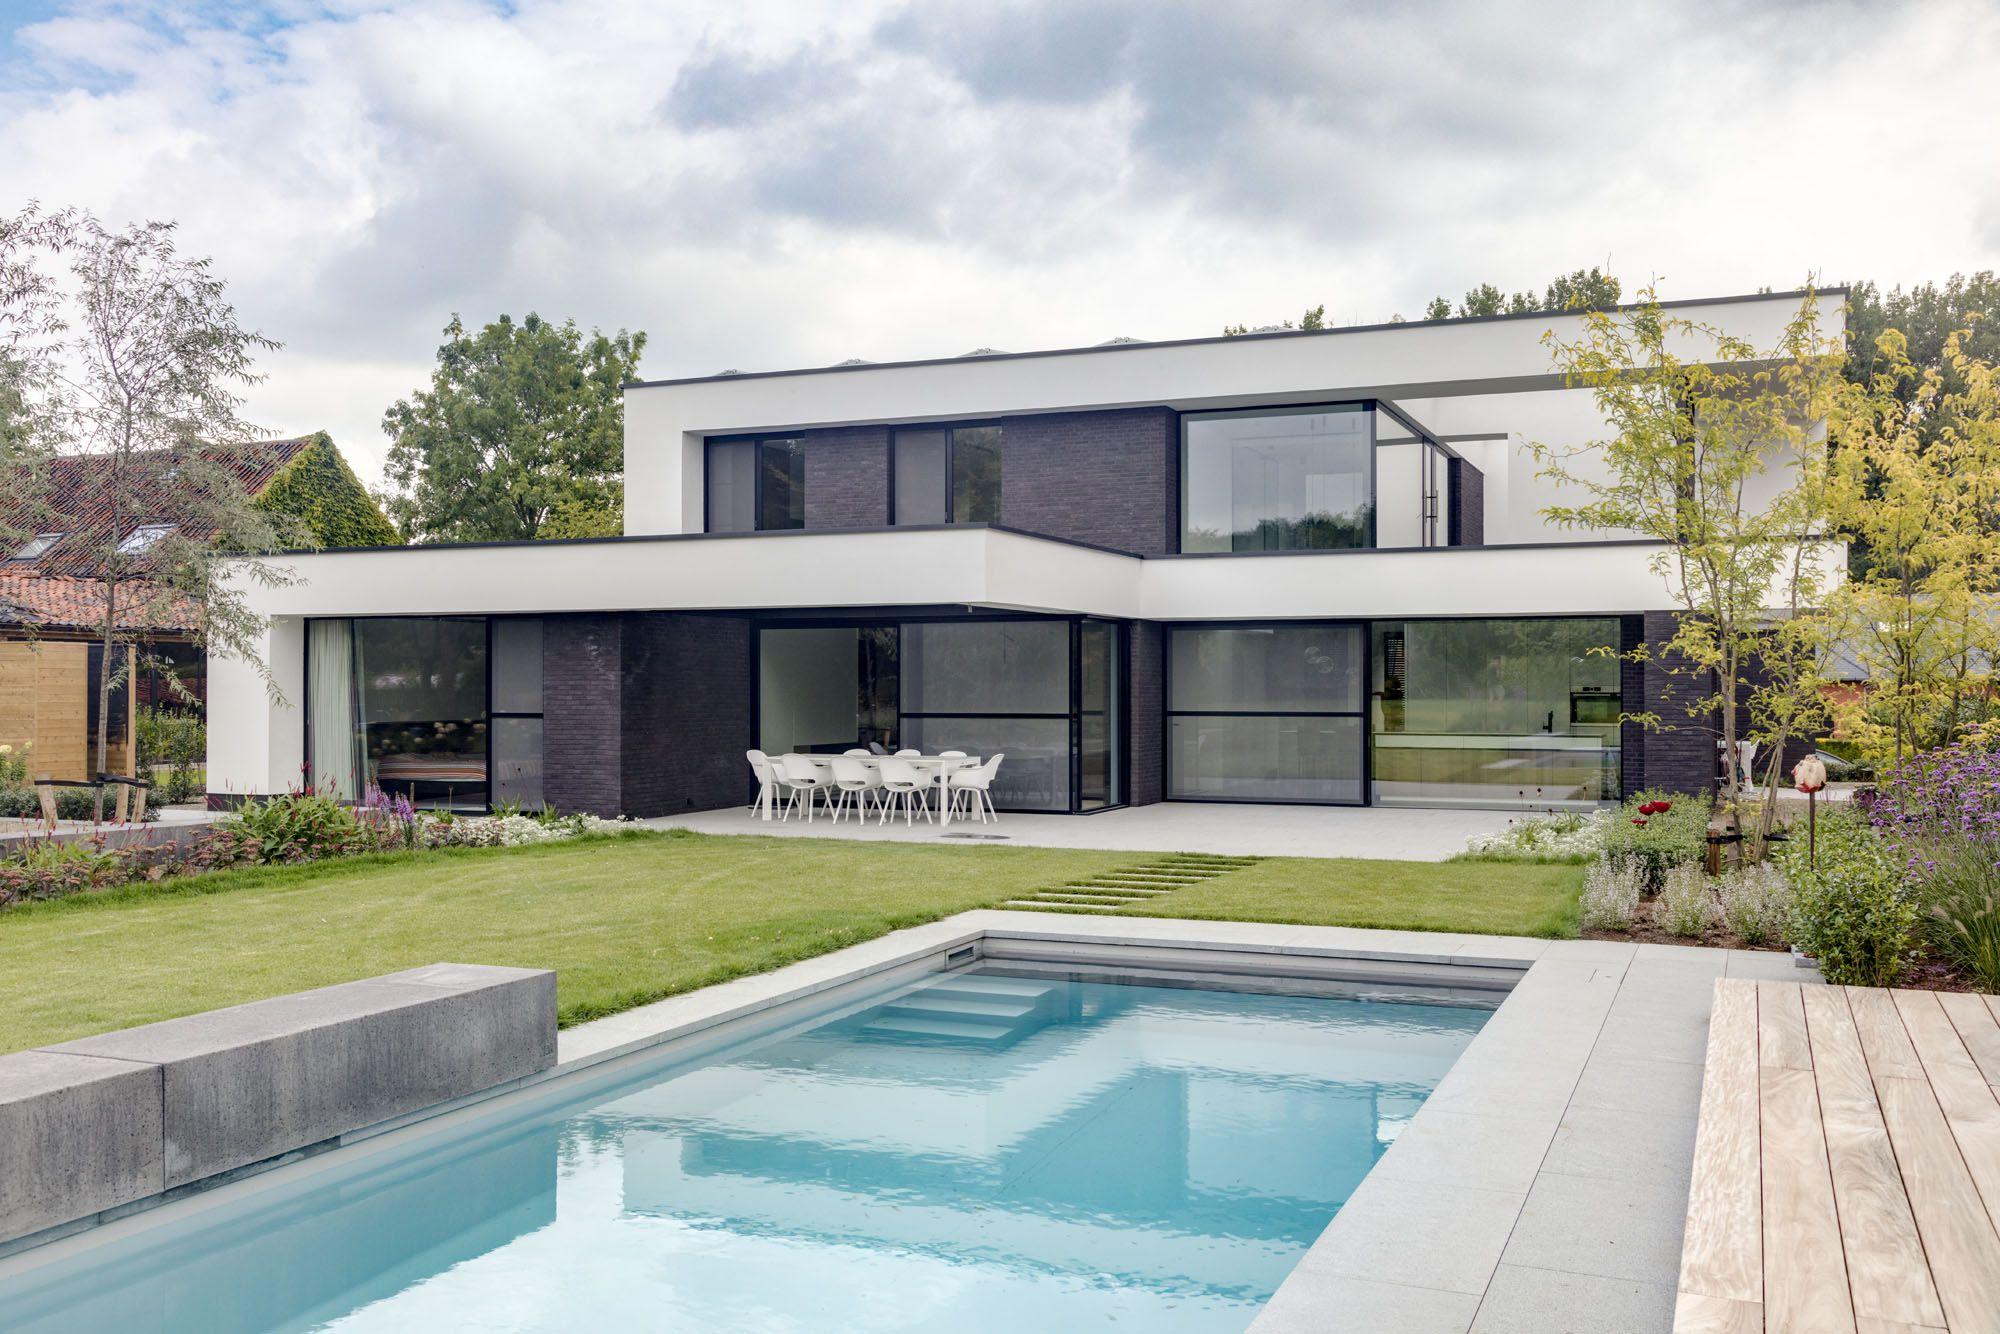 Blockoffice architecten villa te herk de stad strakke